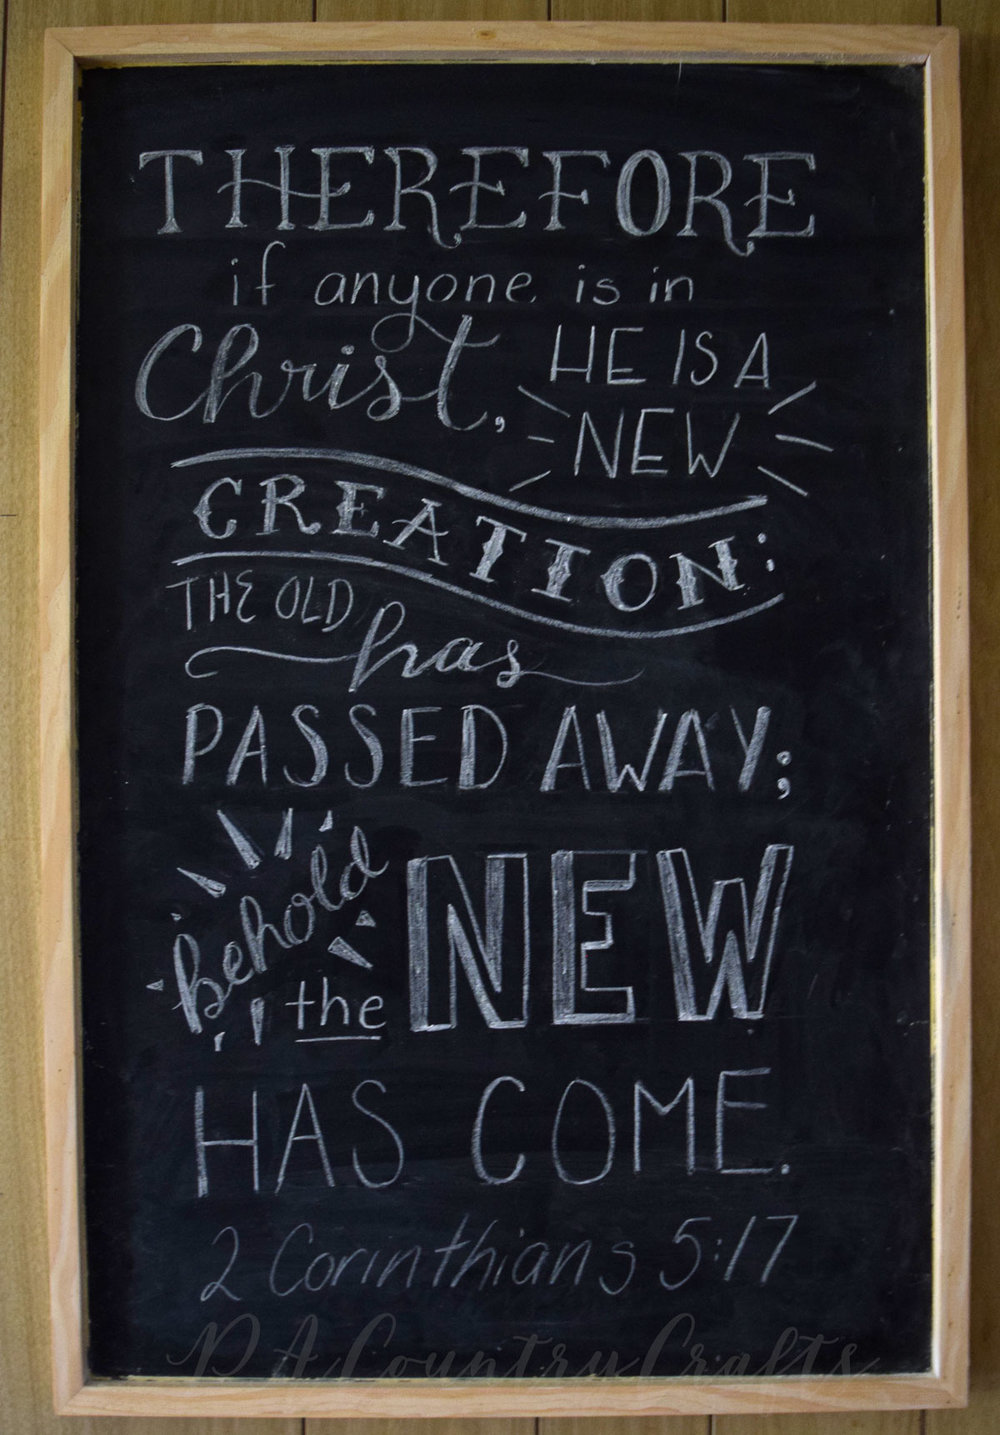 2 Corinthians 5:17 chalkboard